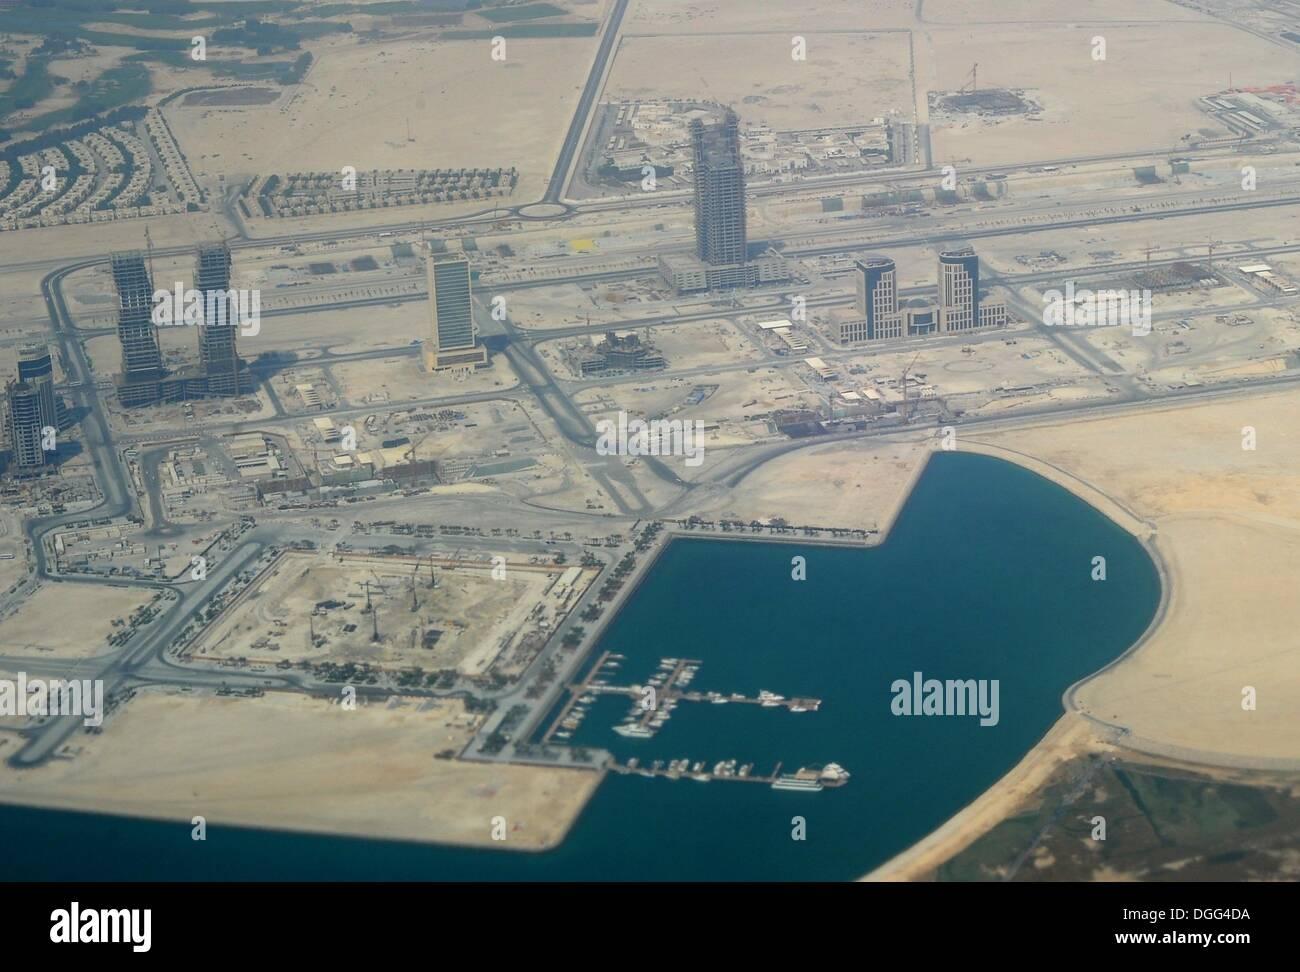 Doha, Qatar. 29th Aug, 2013. Aerial of the port of Doha, Qatar, 29 August 2013. Photo: Britta Pedersen/dpa/Alamy Live News - Stock Image